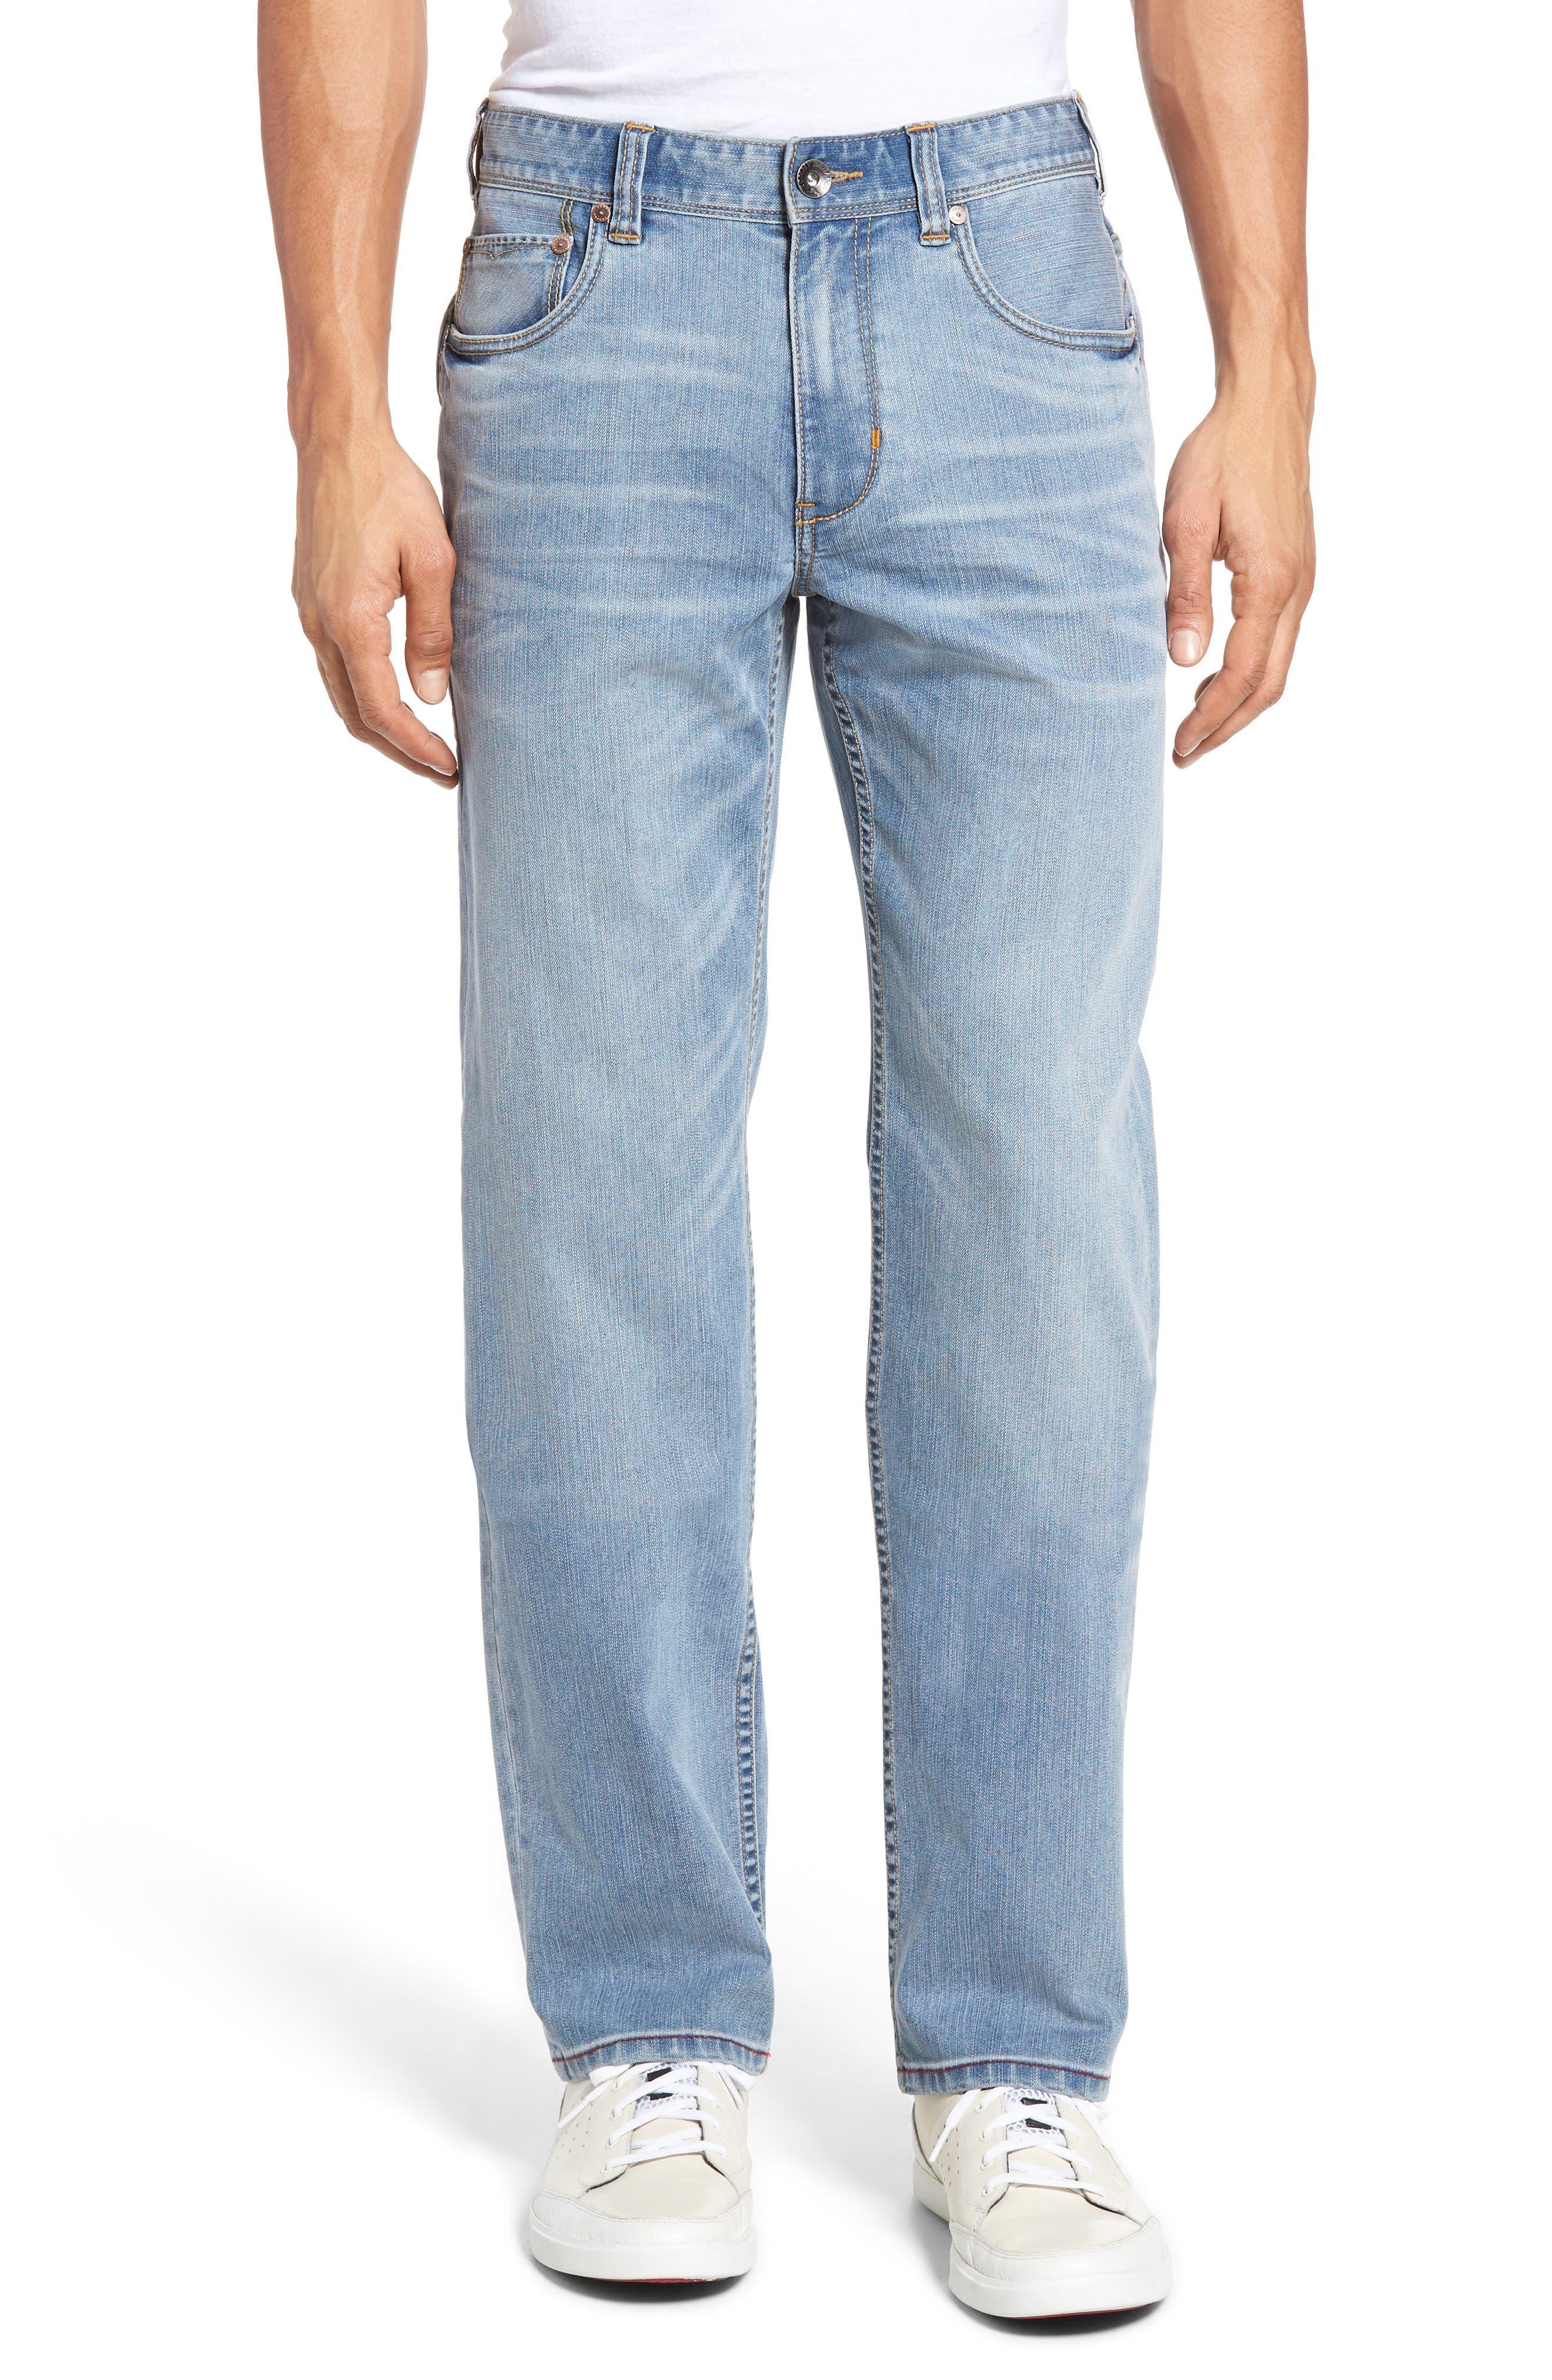 Sorrento Straight Leg Jeans,                         Main,                         color, Light Wash